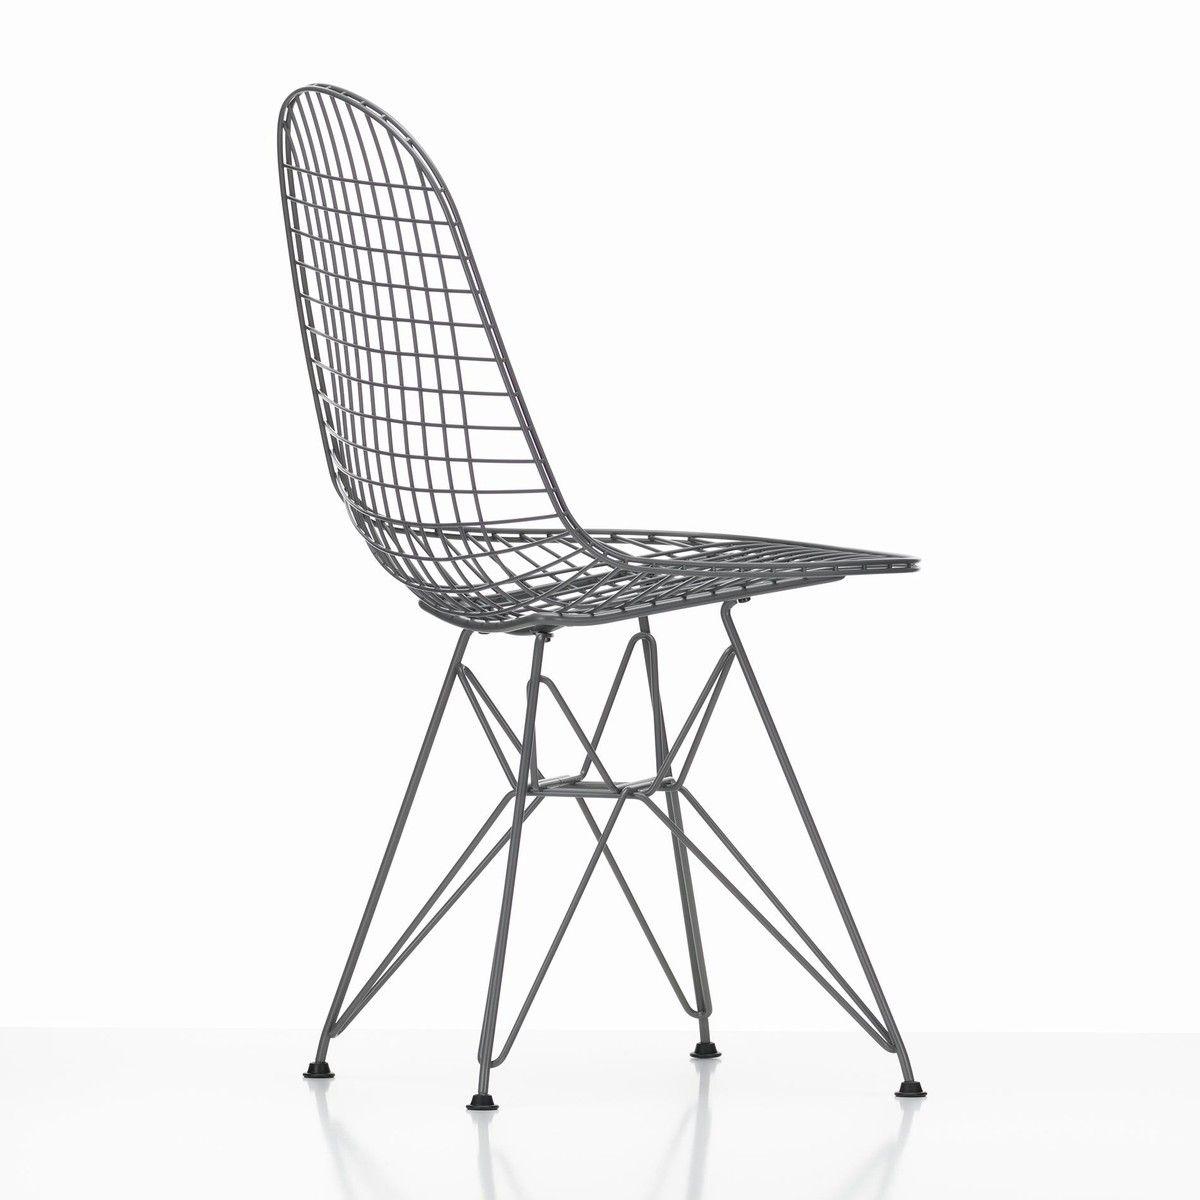 designer stuhl vitra latest full size of design stuhl vitra eames geschichte holz gunstig weis. Black Bedroom Furniture Sets. Home Design Ideas